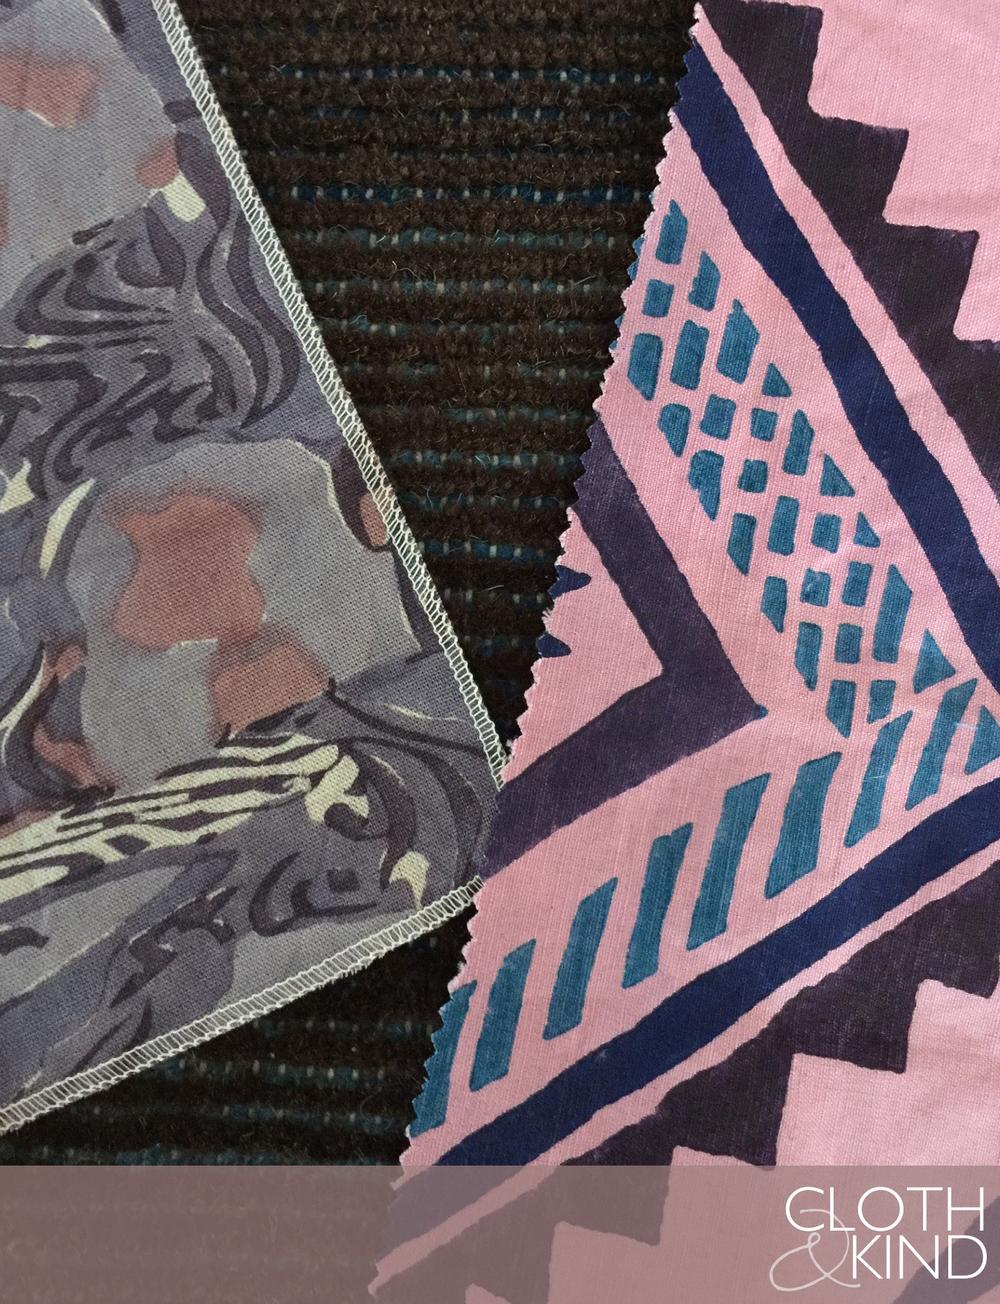 CLOTH & KIND // Palette No. 52